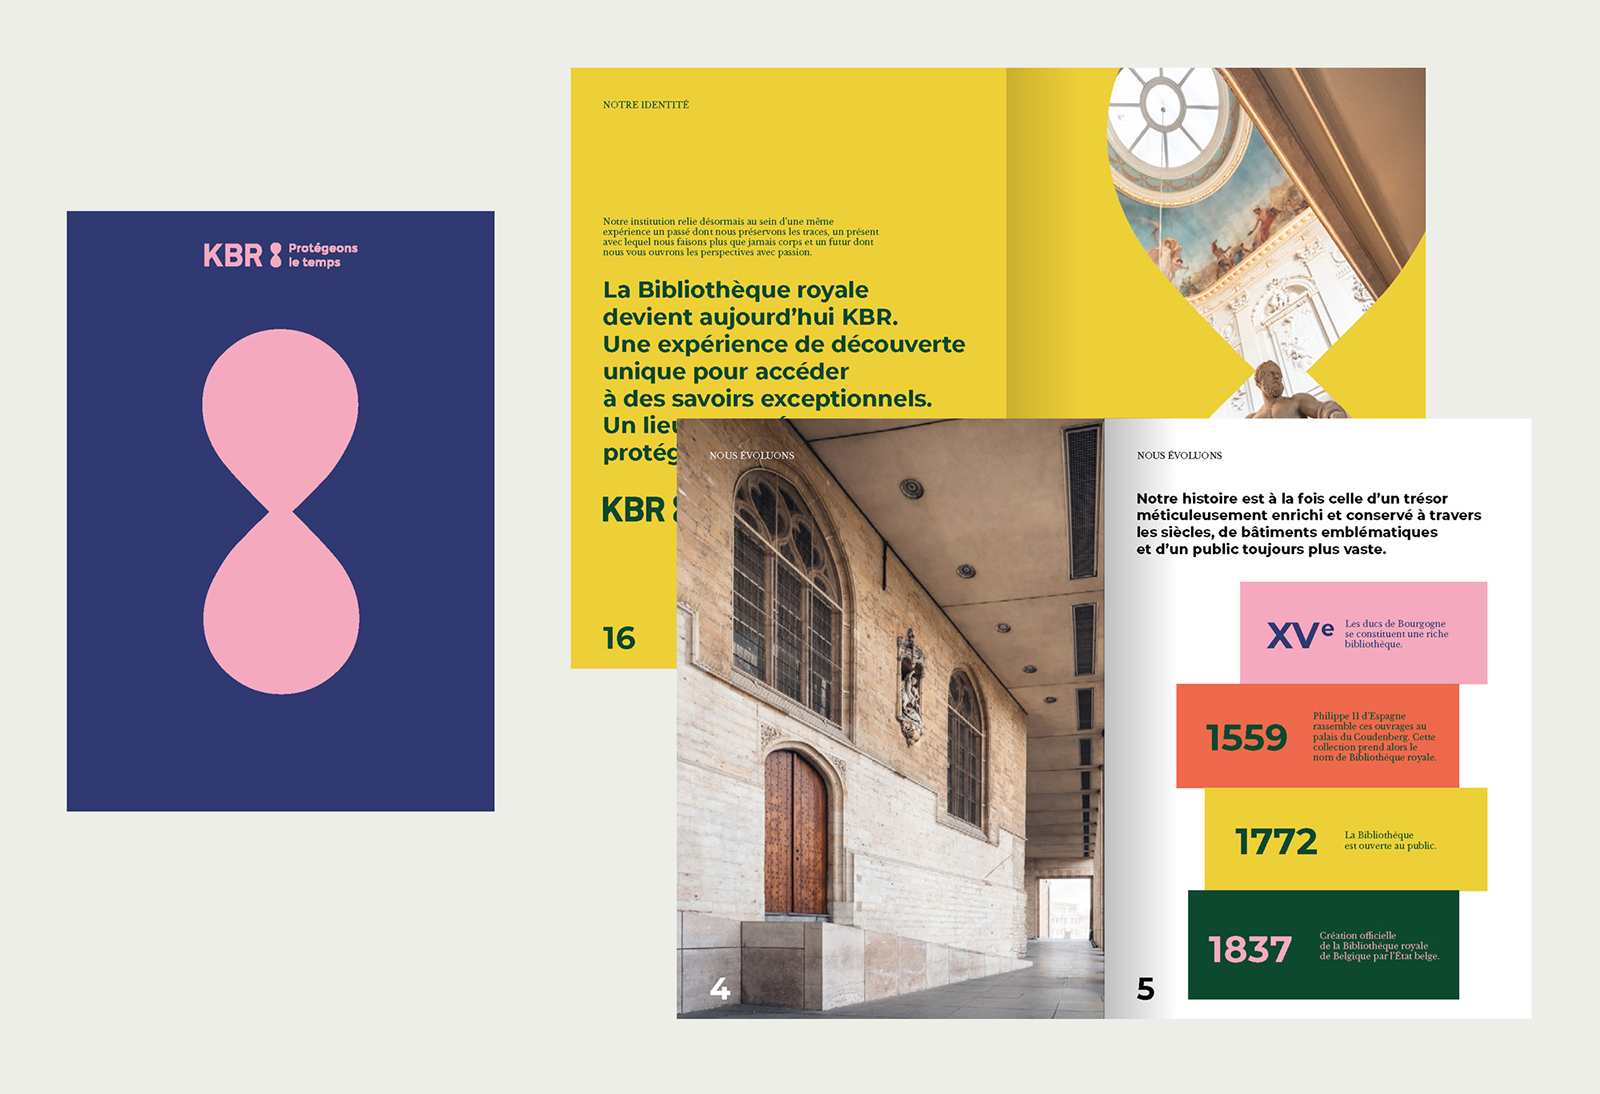 KBR比利时皇家图书馆启用全新的品牌VI形象设计-深圳VI设计9